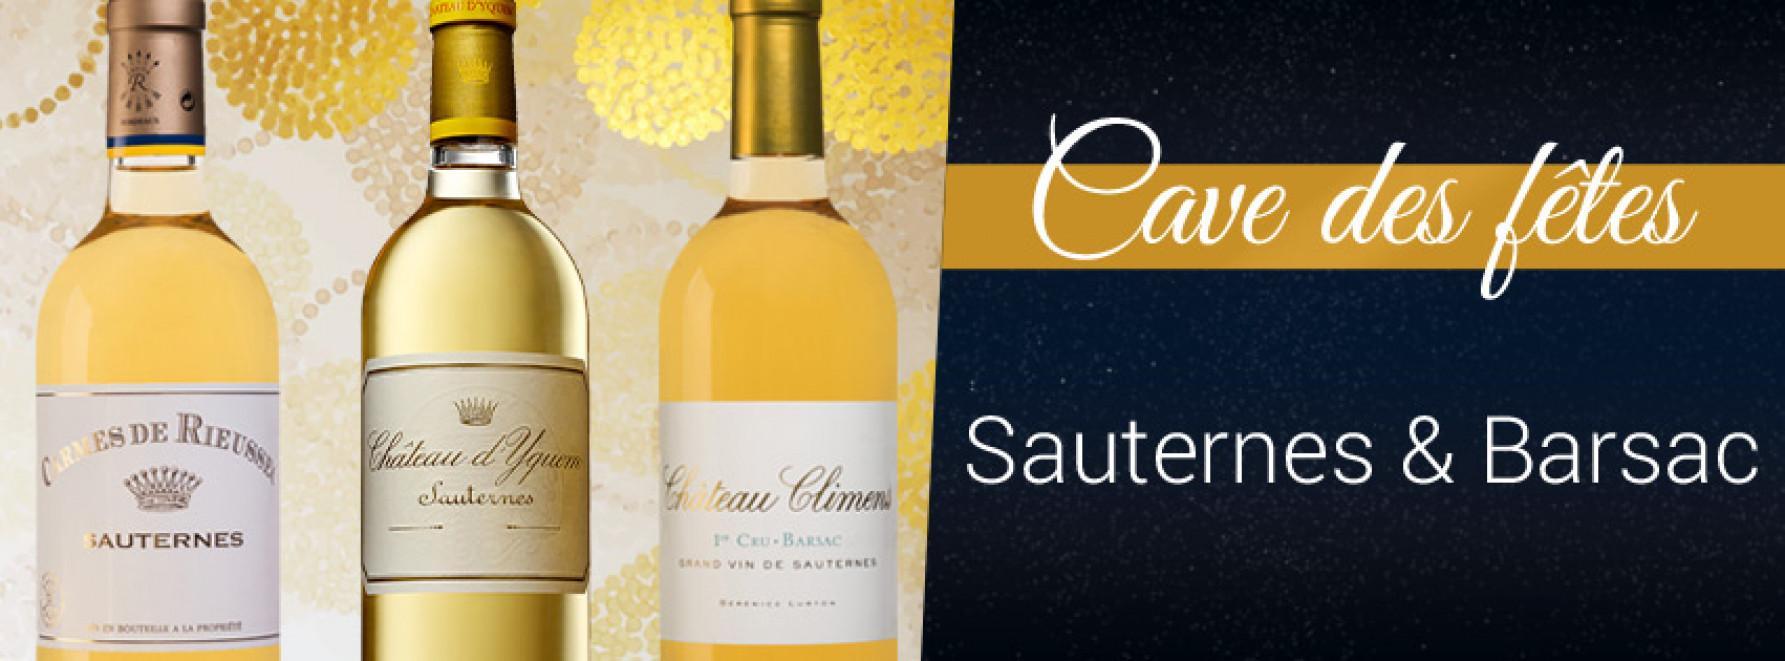 Cave des Fêtes | Sauternes & Barsac